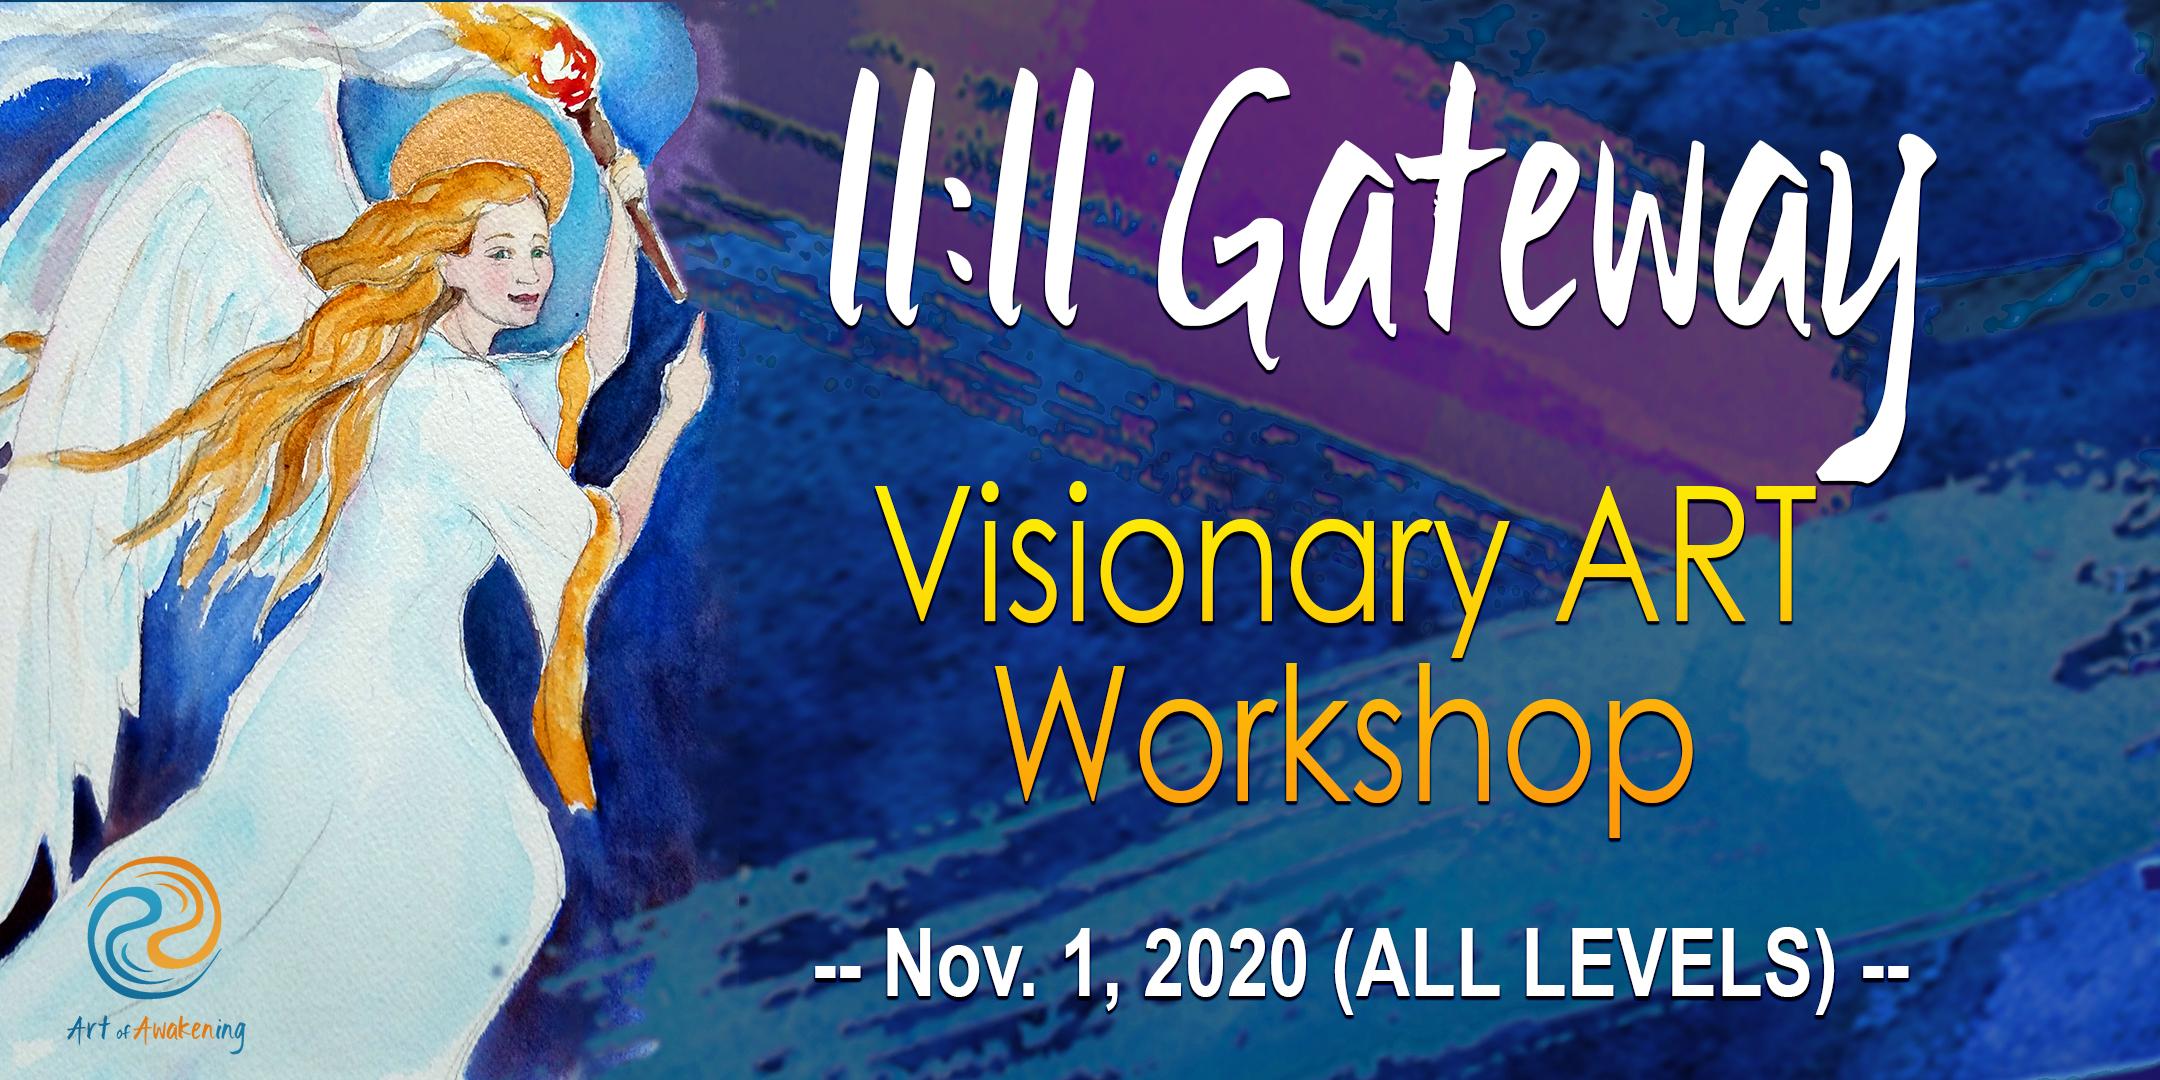 11:11 Gateway Visionary Art Workshop